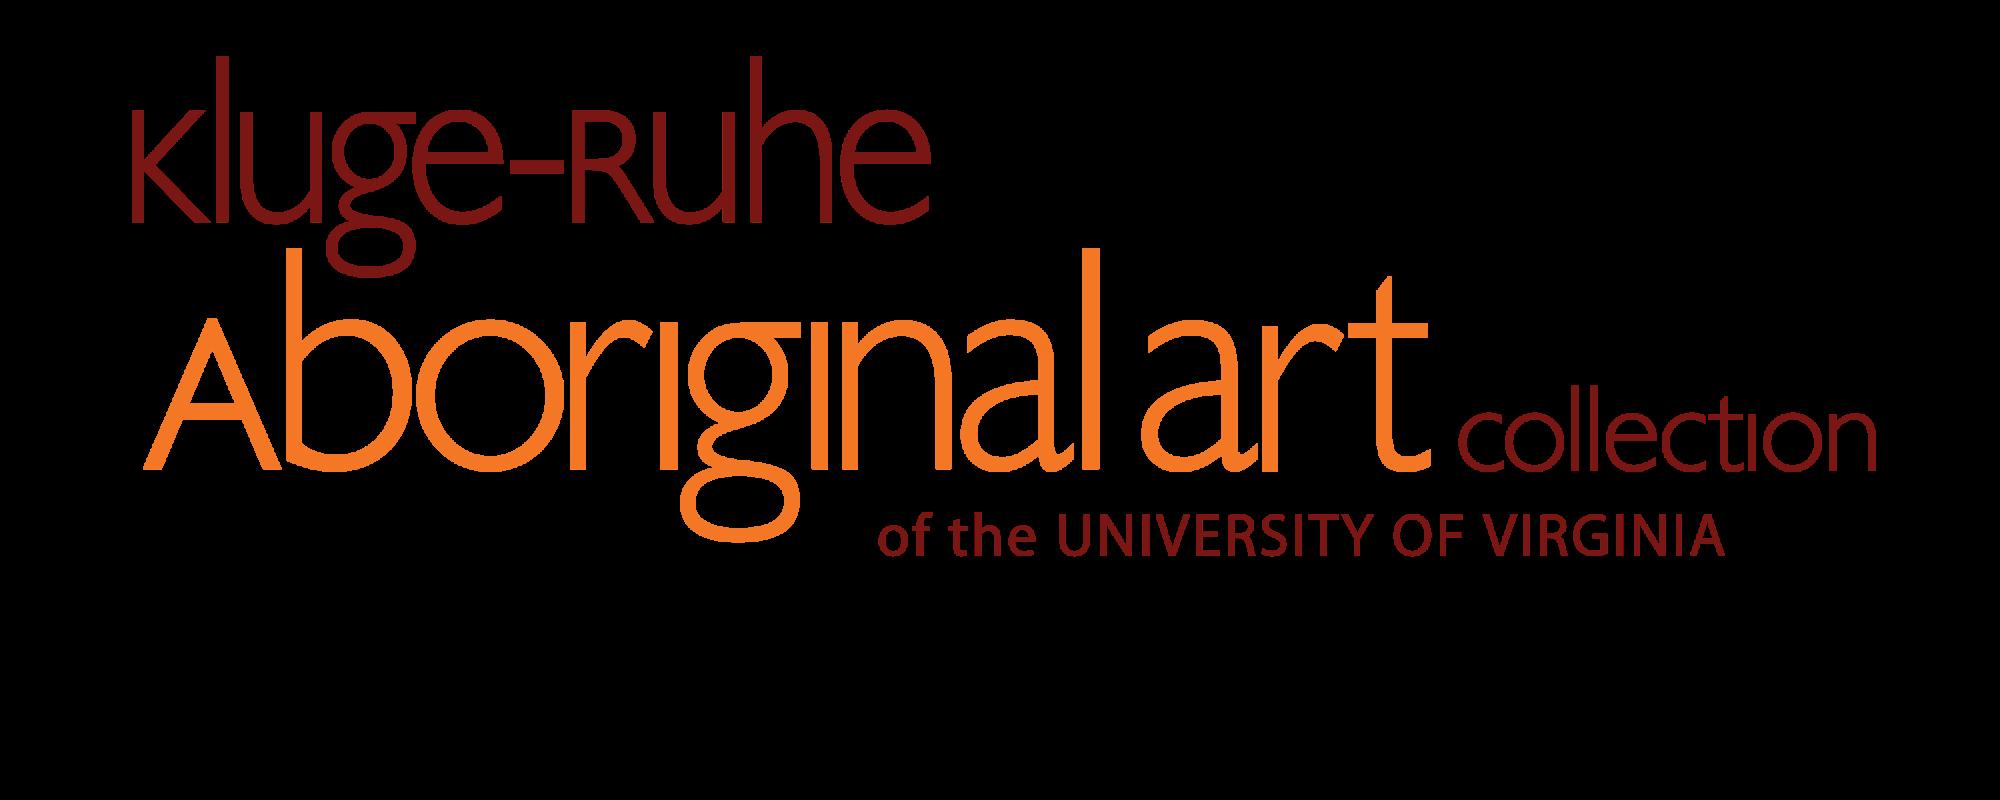 Kluge-Ruhe-logofinal-1-2000x800.png